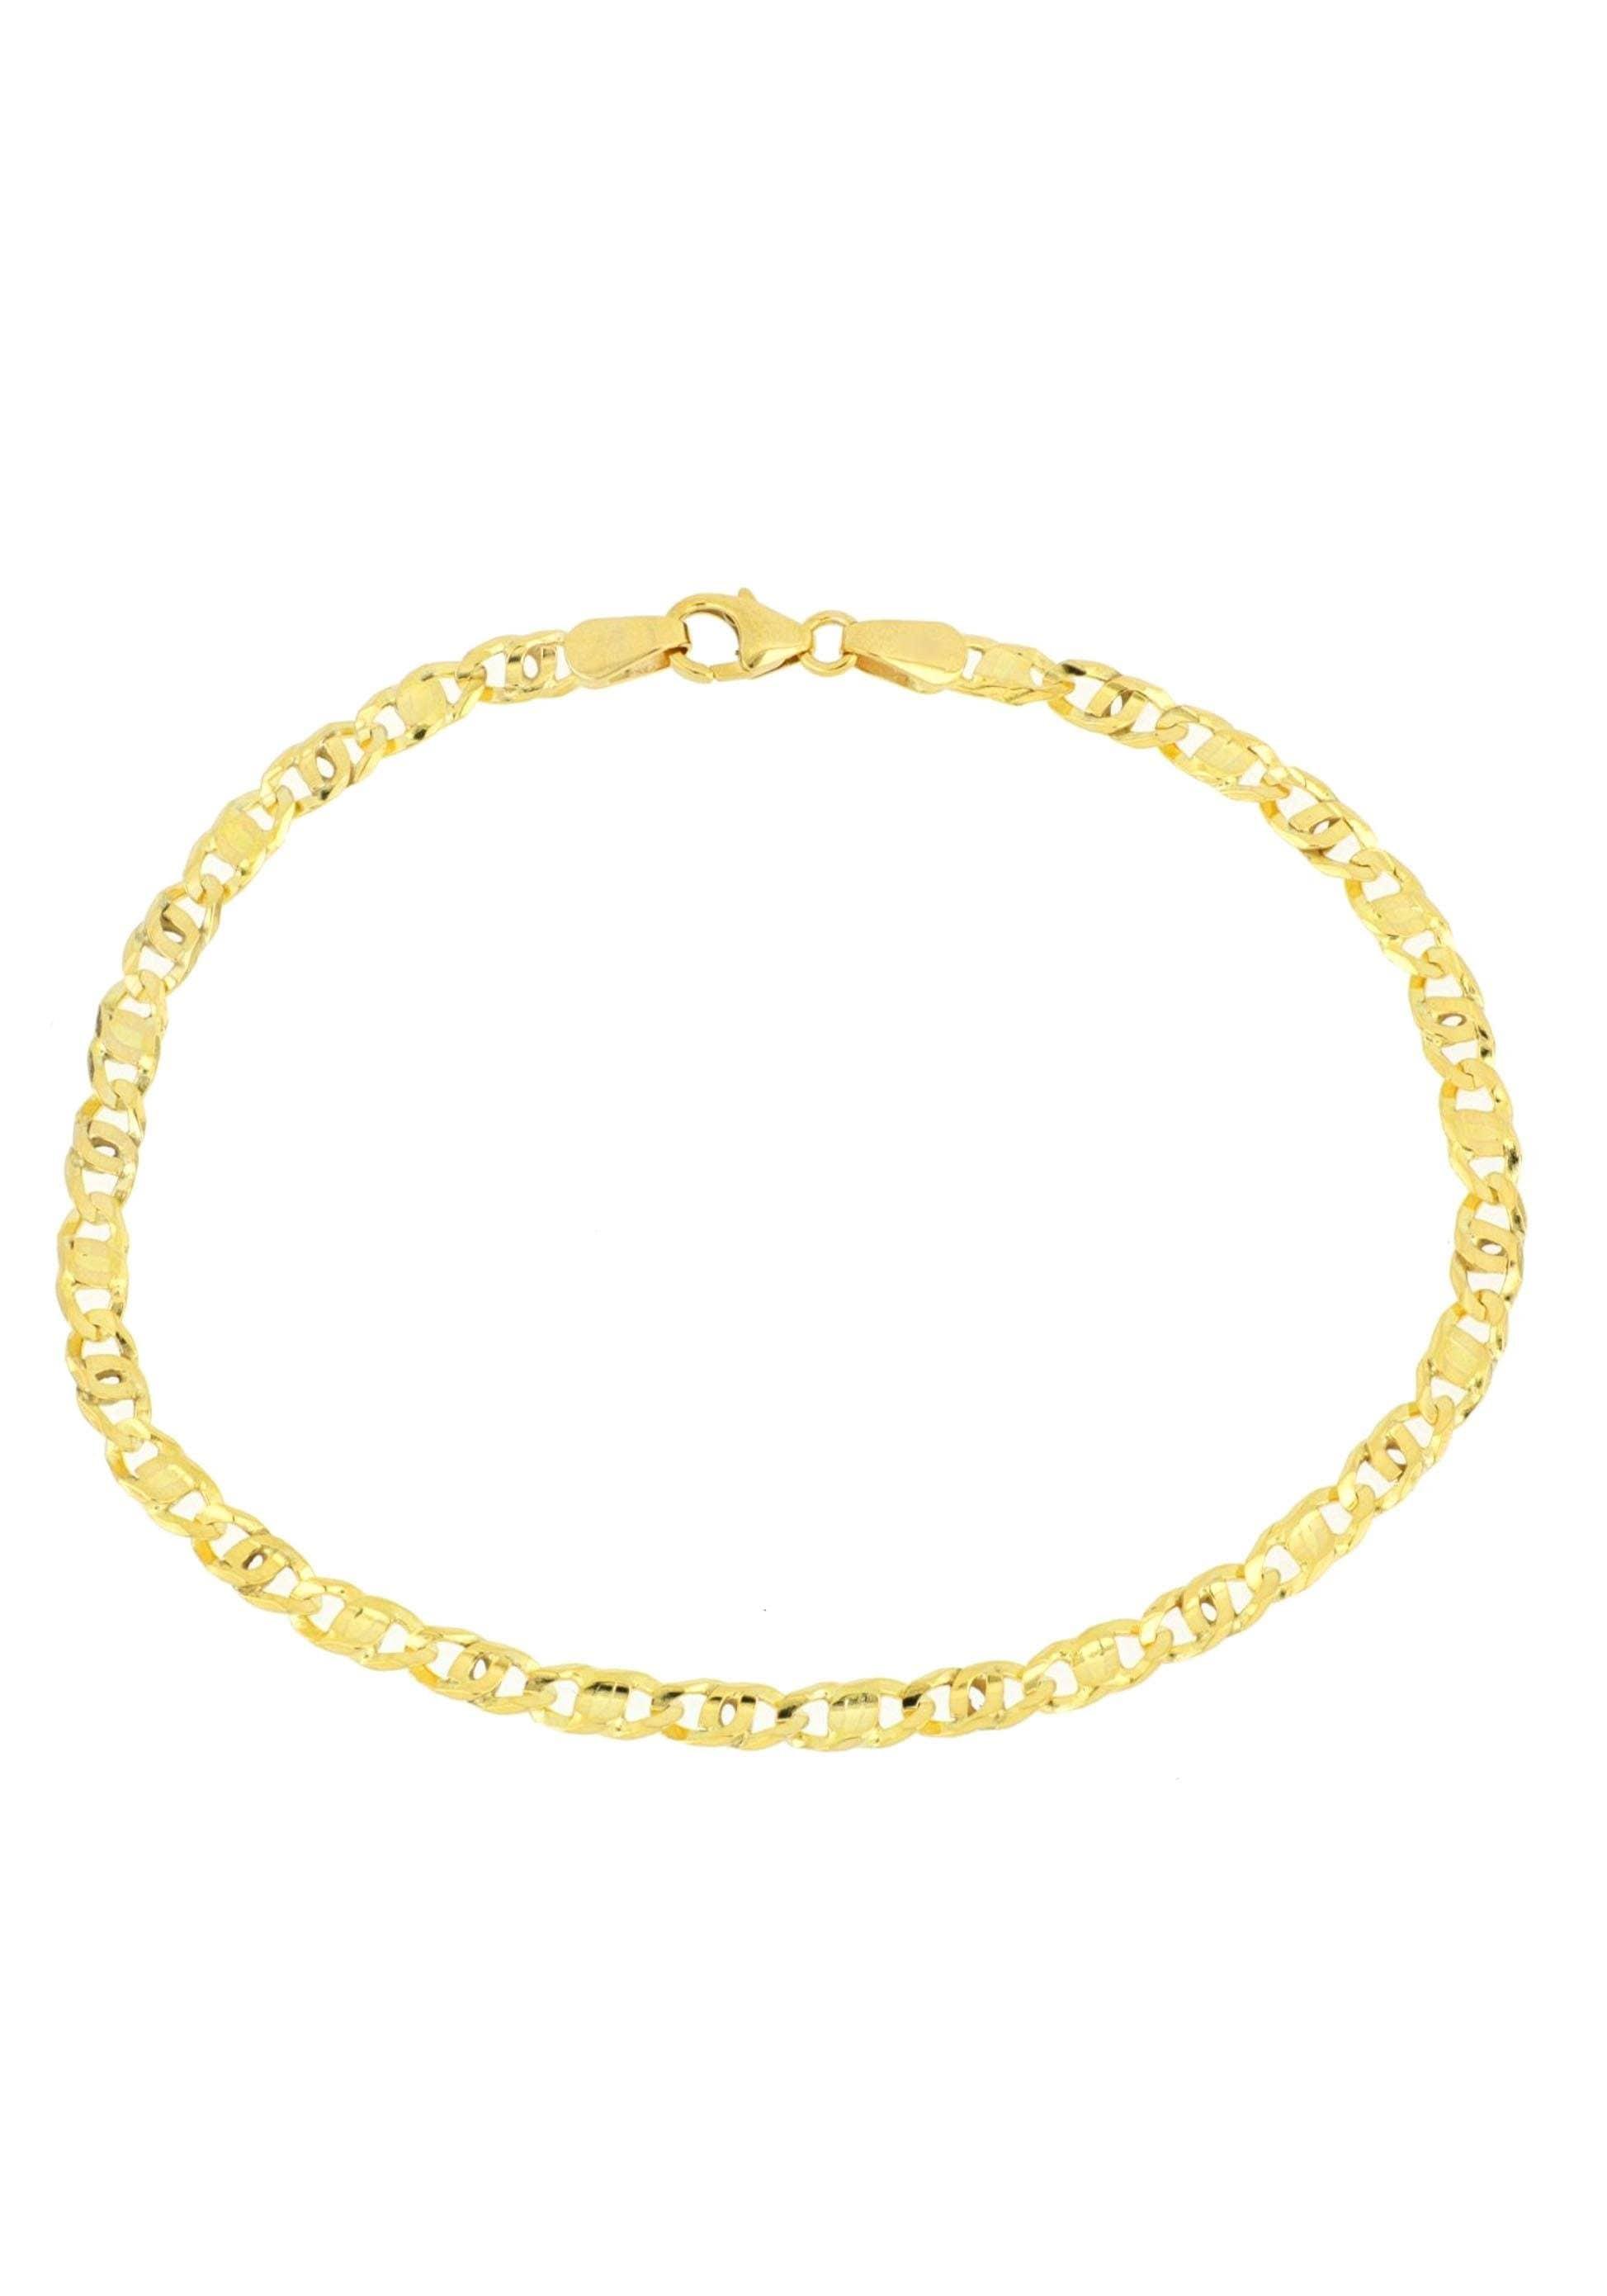 Firetti Goldarmband in Tigeraugenkettengliederung diamantiert poliert konkav   Schmuck > Armbänder > Goldarmbänder   Firetti